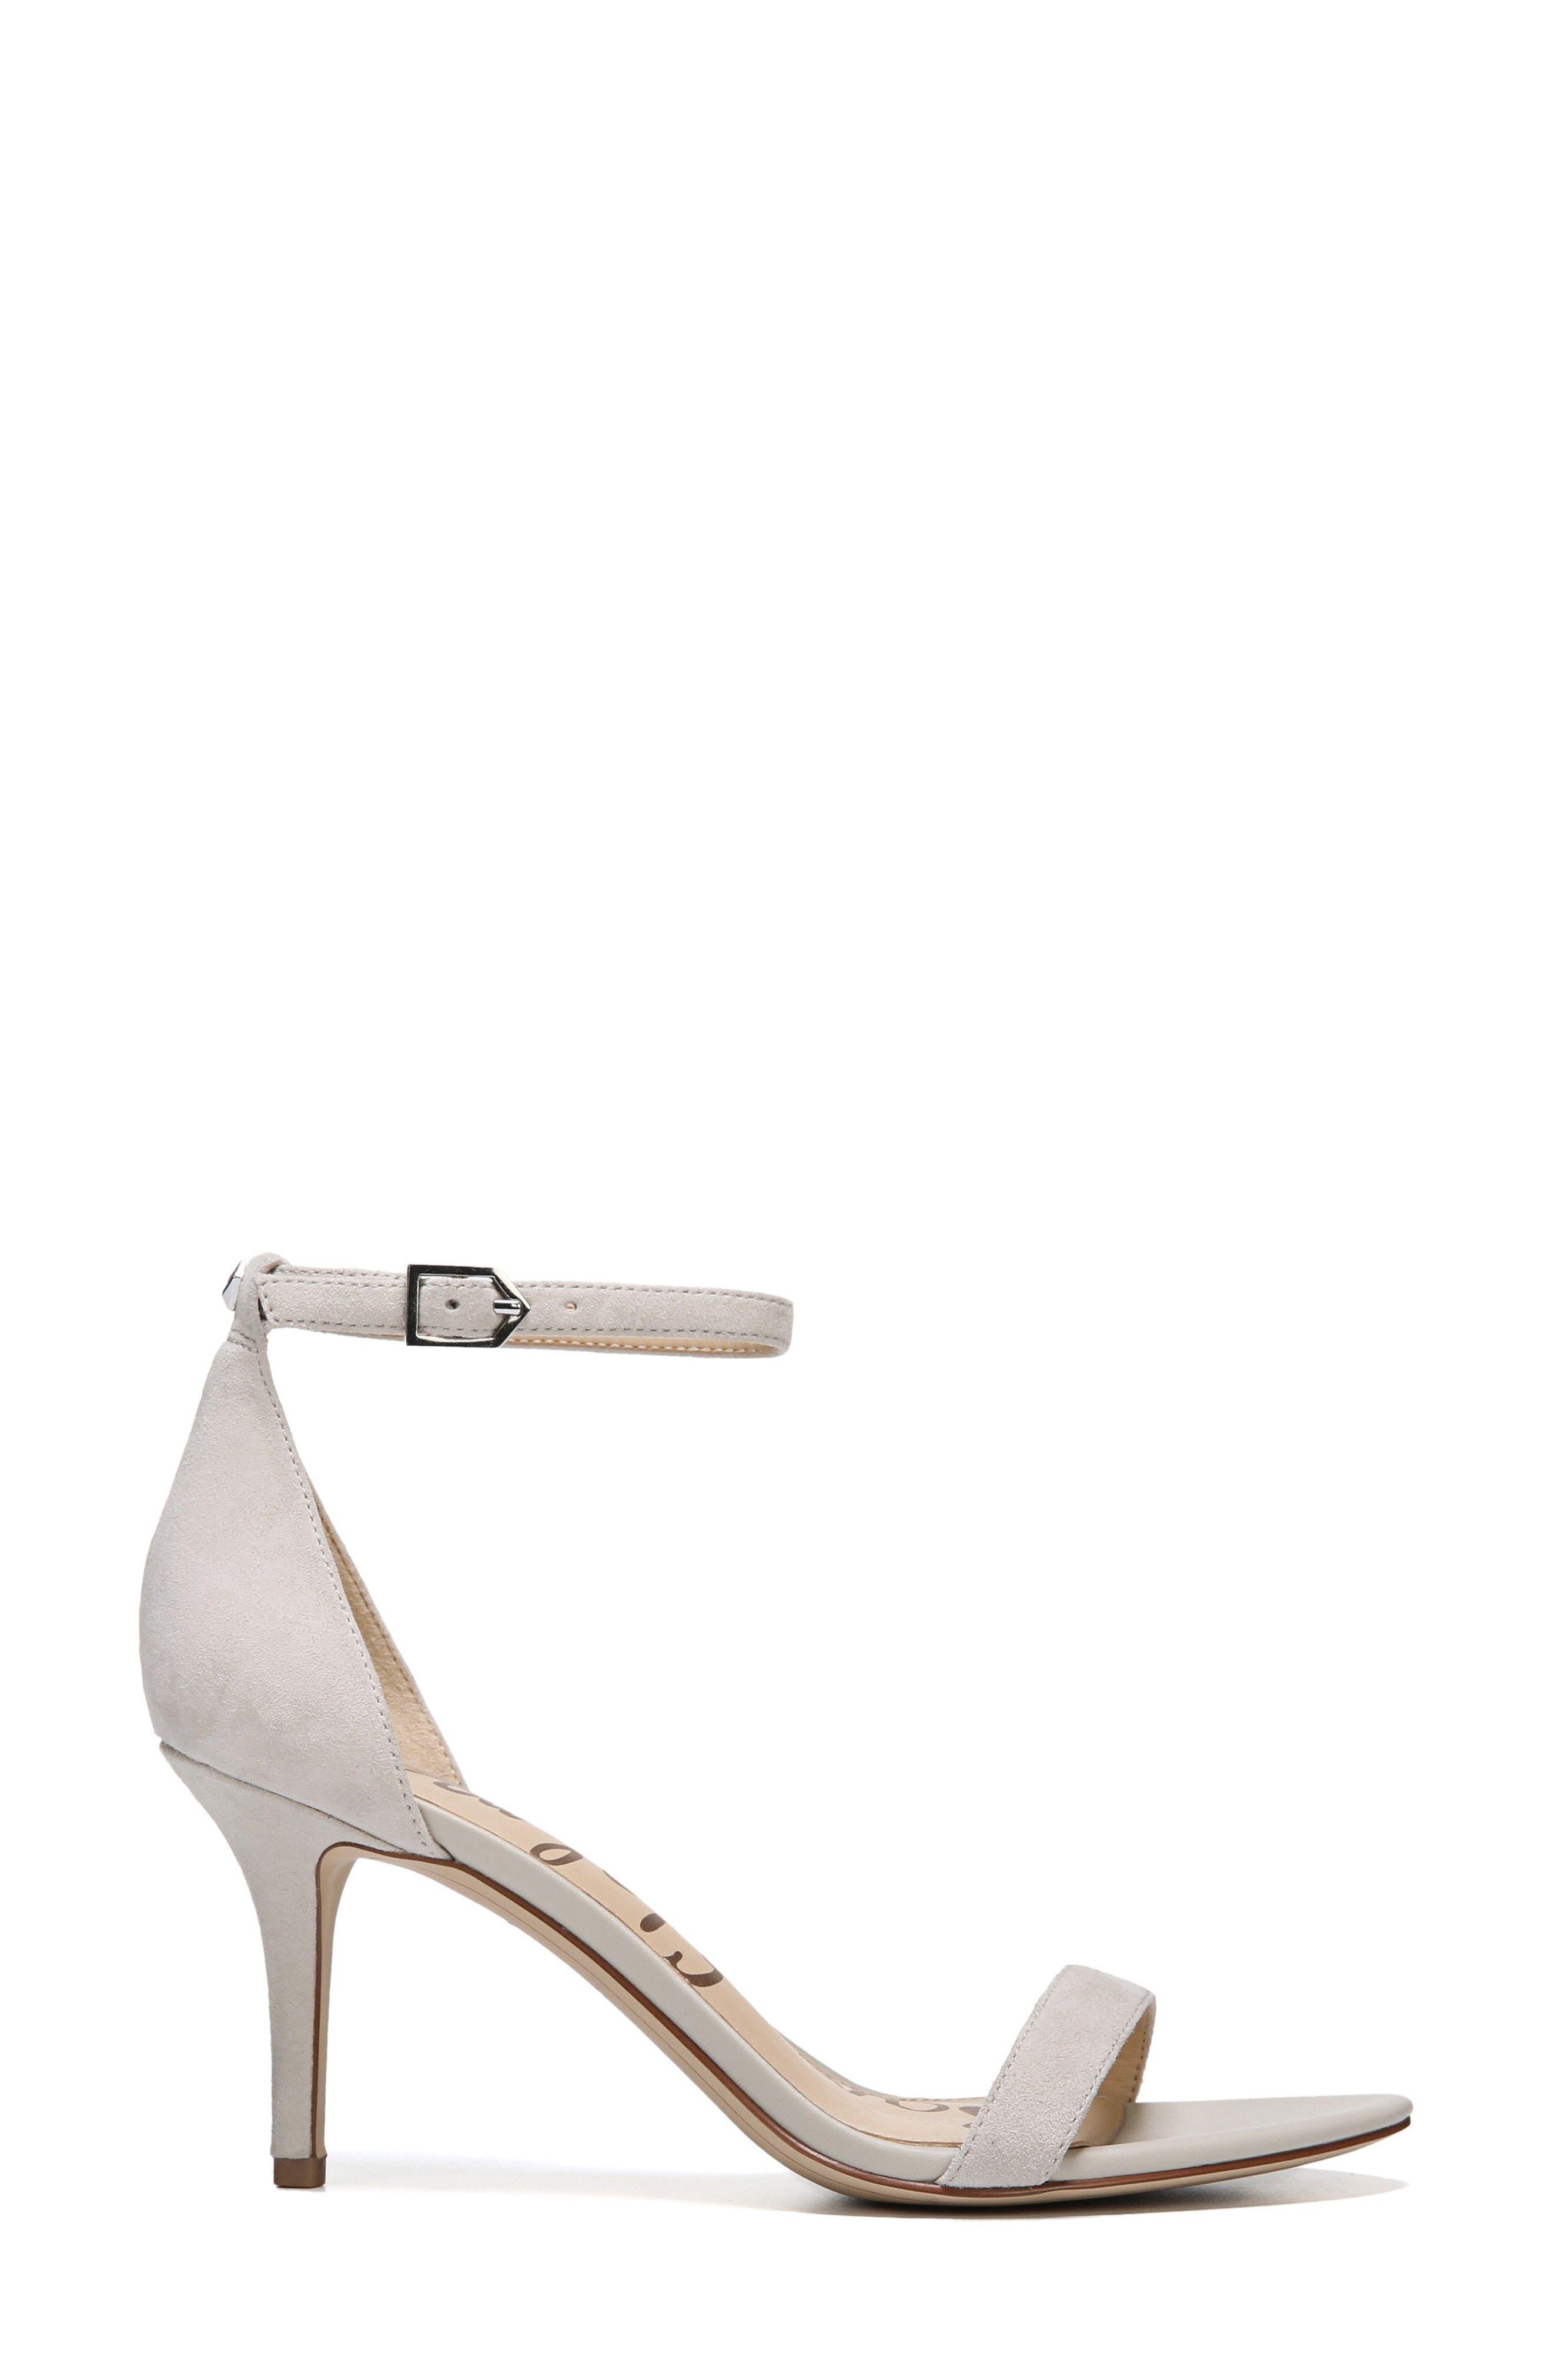 ,                             'Patti' Ankle Strap Sandal,                             Alternate thumbnail 158, color,                             021